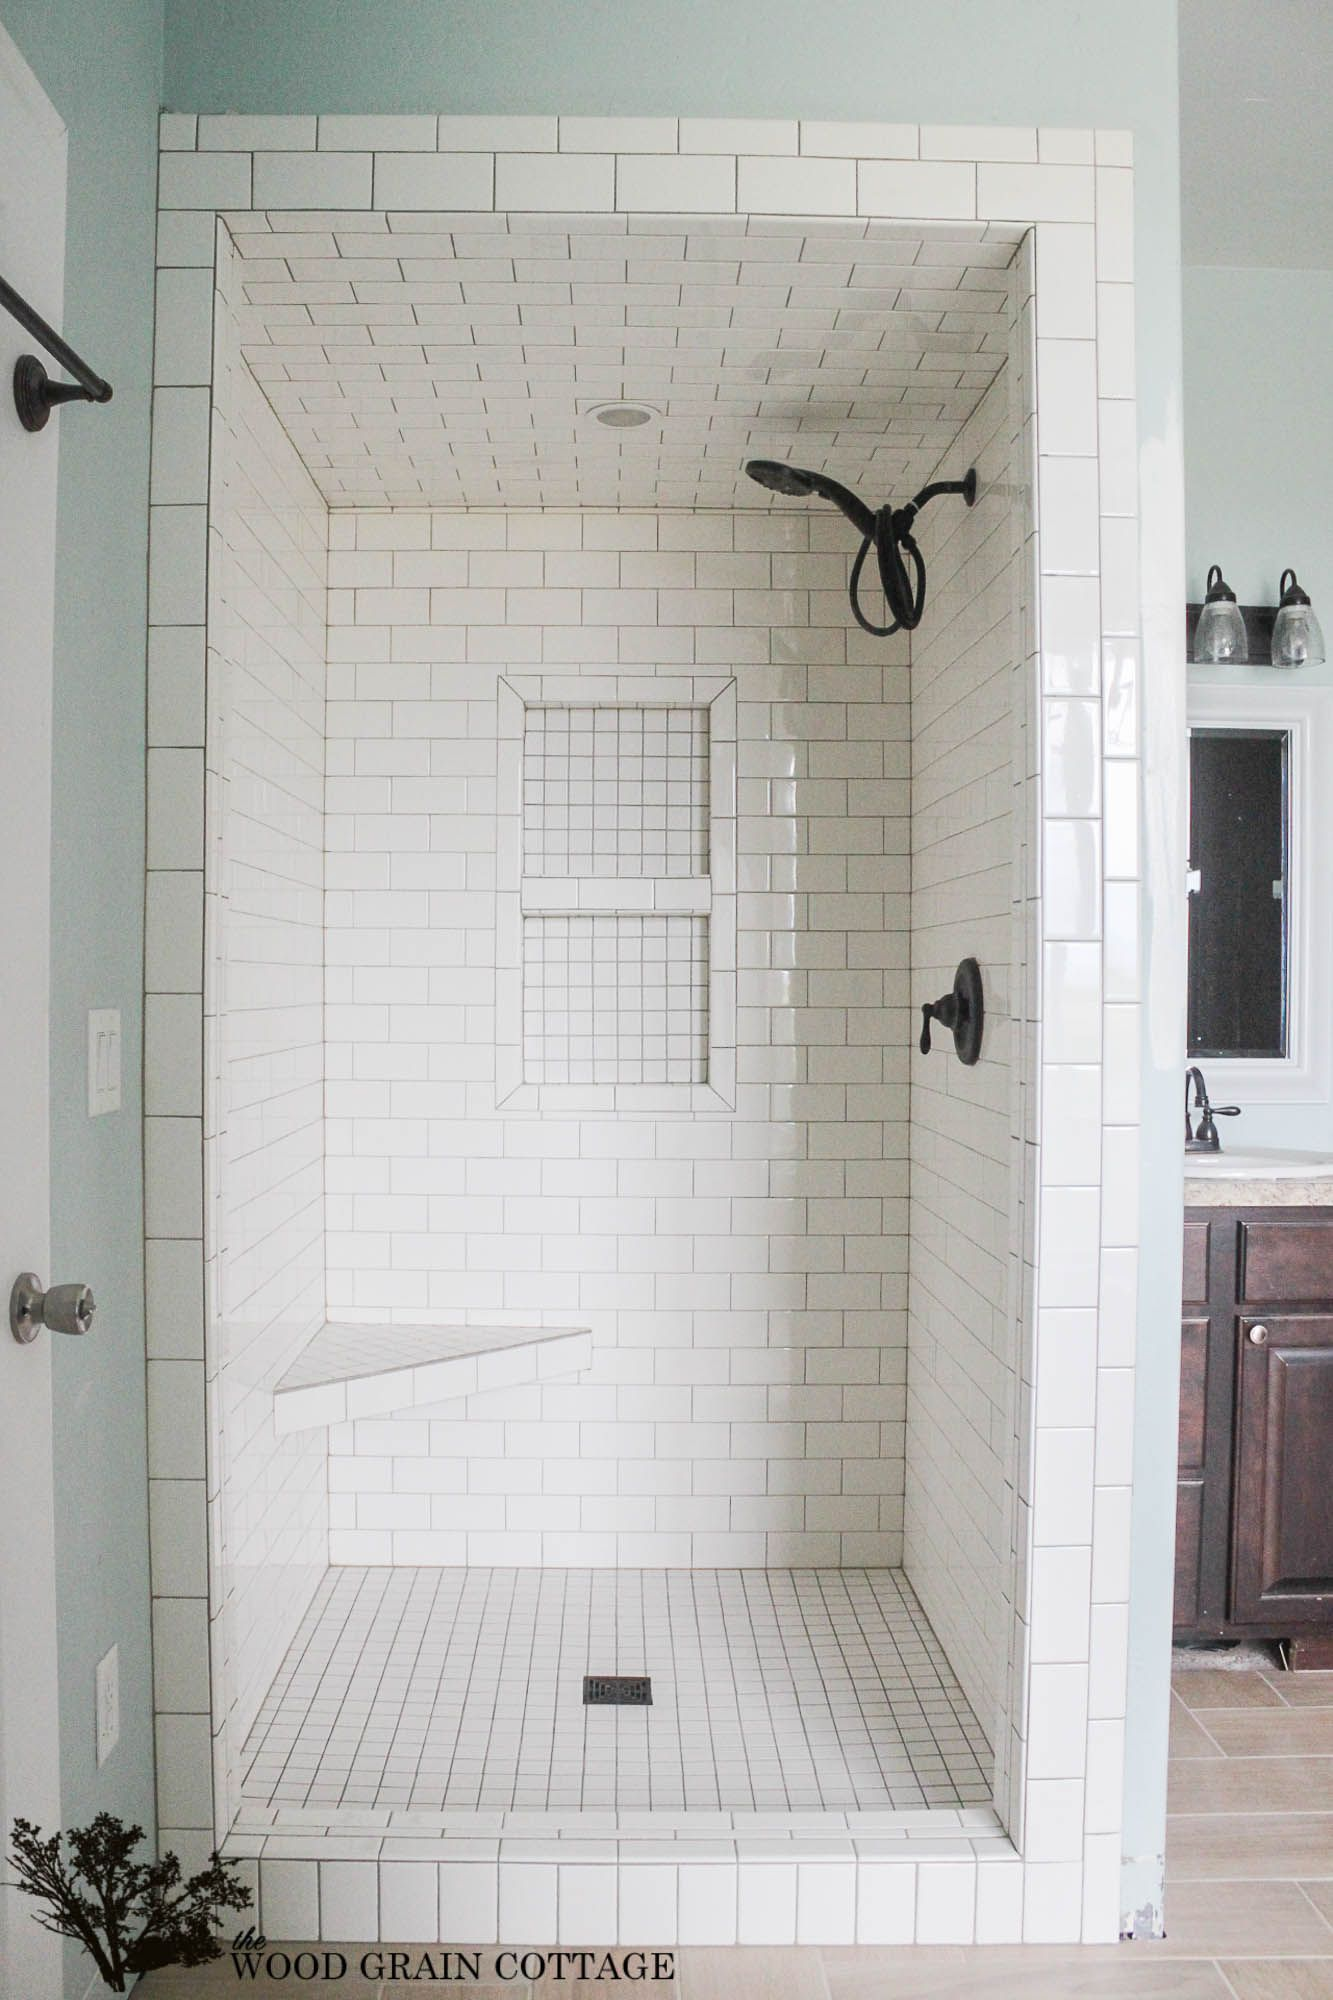 New Master Bathroom Tile The Wood Grain Cottage Small Bathroom